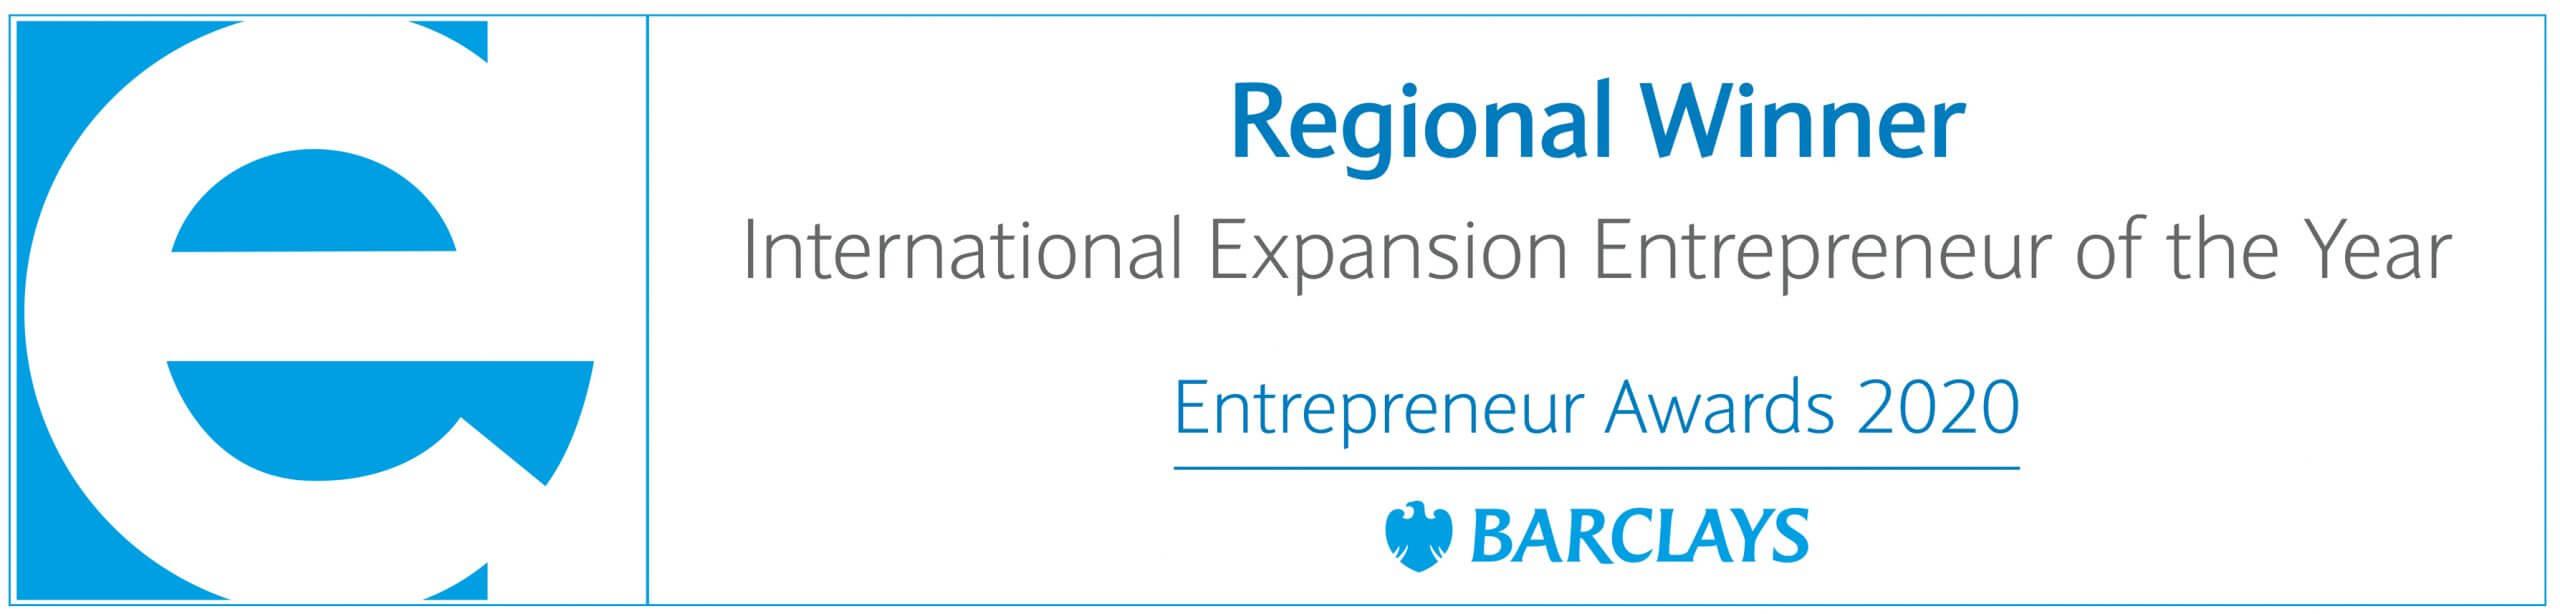 CatSci Wins Prestigious Barclays Entrepreneur Award